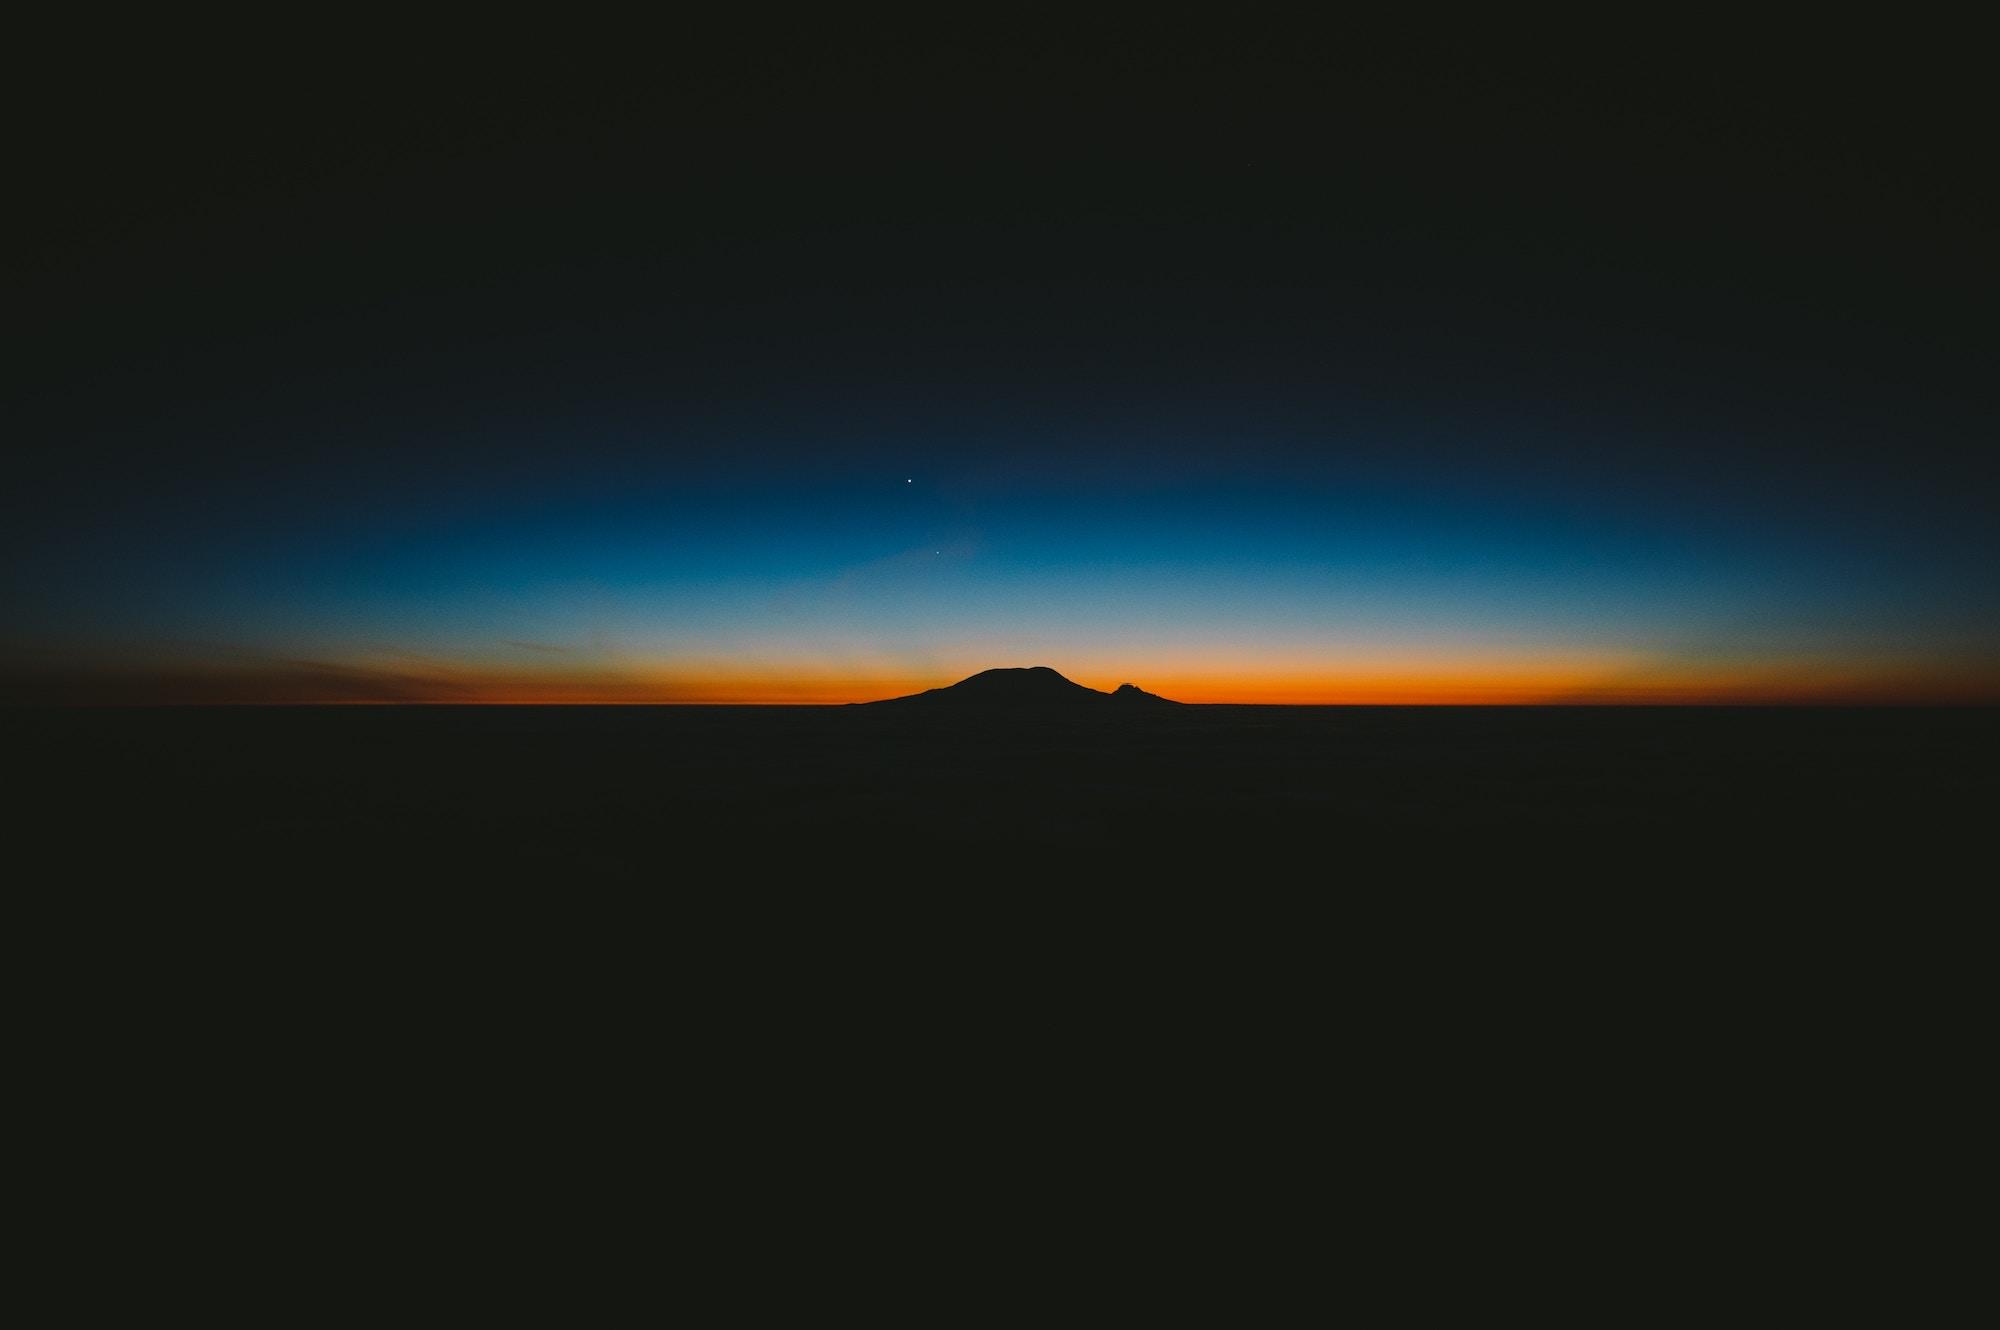 mt kilimanjaro night